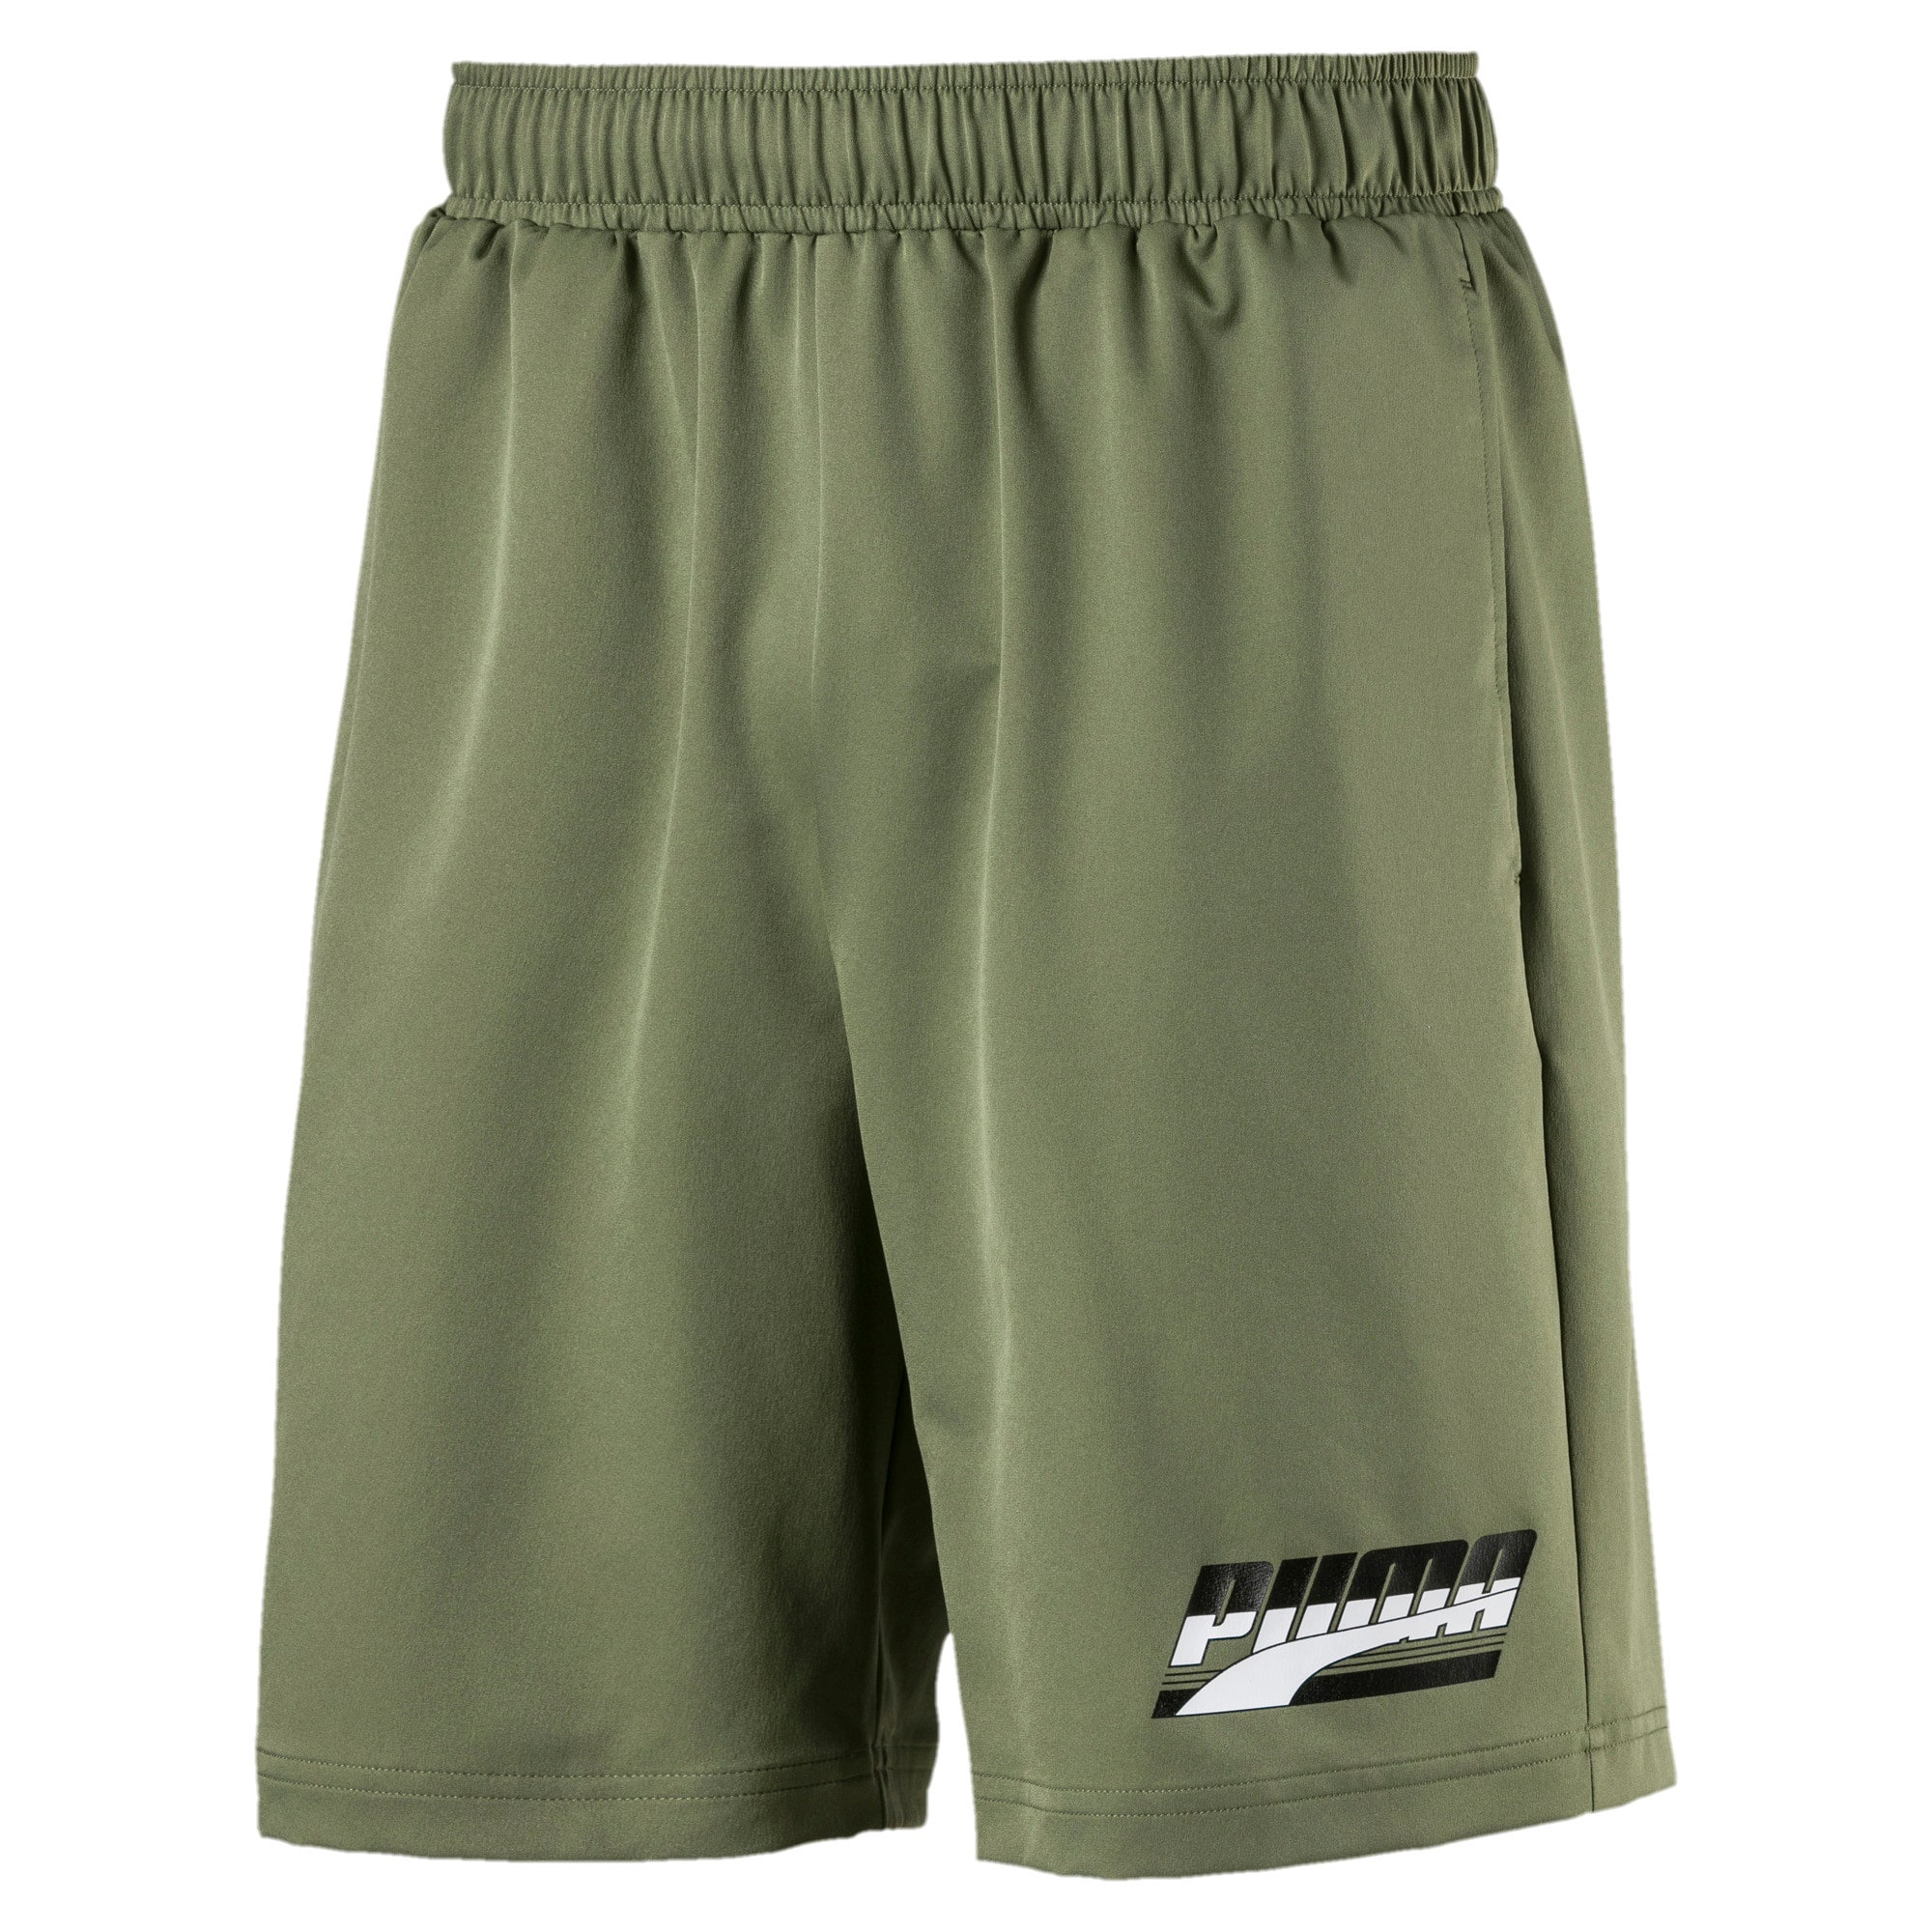 "Thumbnail 1 of Rebel Men's 8"" Woven Shorts, Olivine, medium"